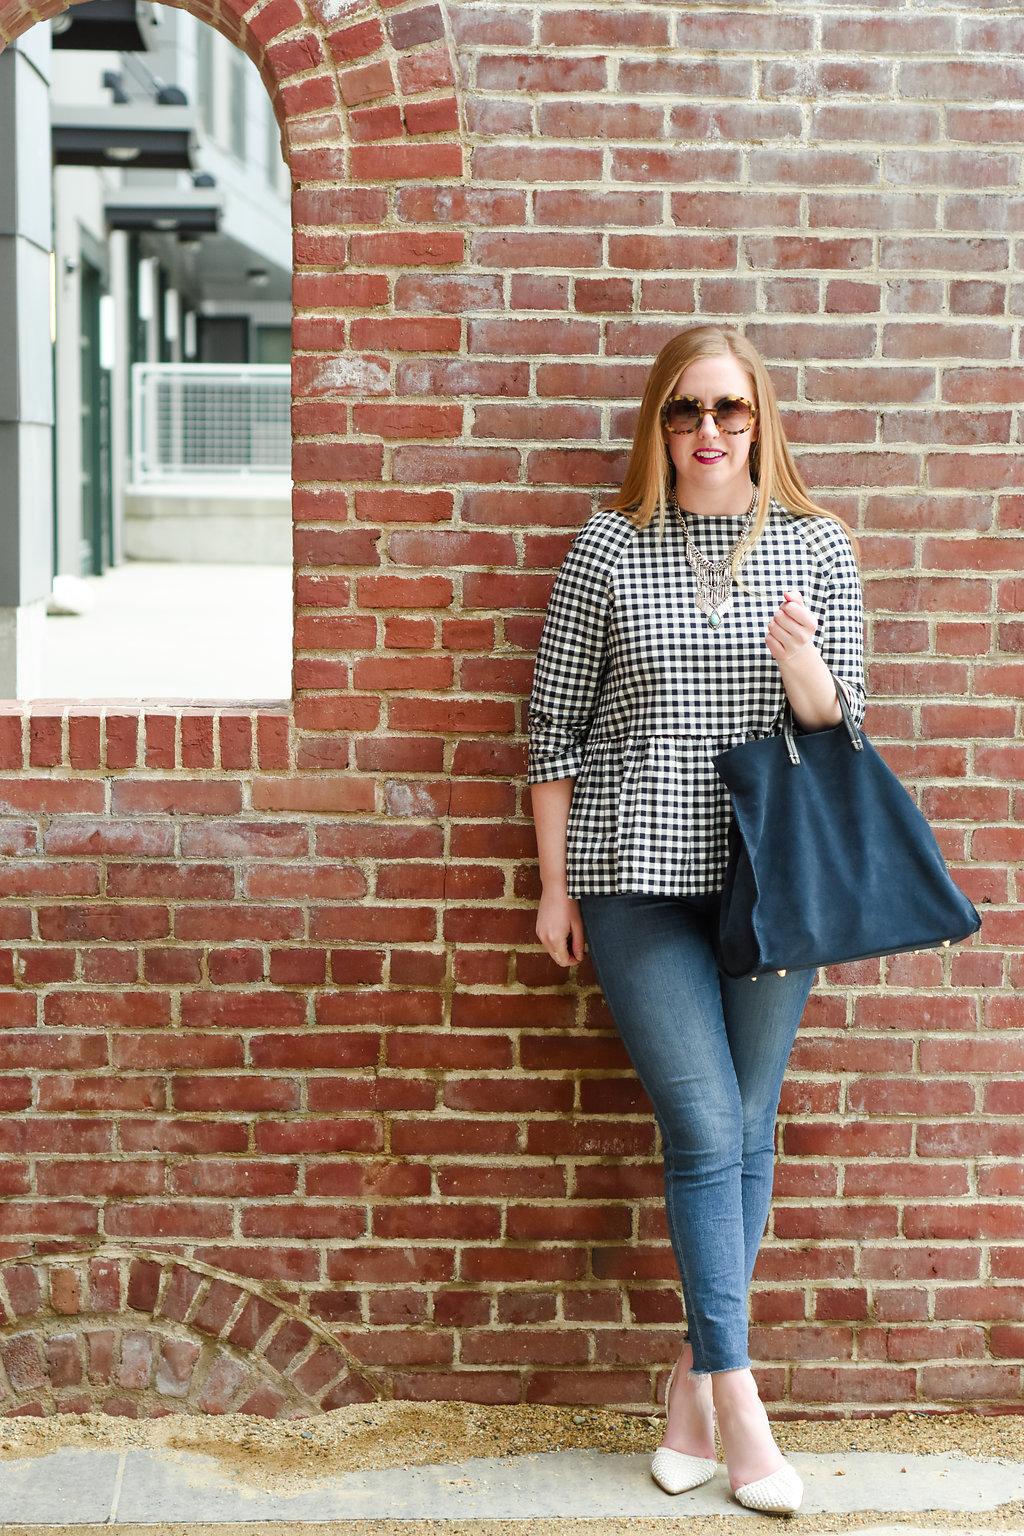 target victoria beckham boston; boston target style blogger; gingham spring style; boston spring style; boston bloggers spring;